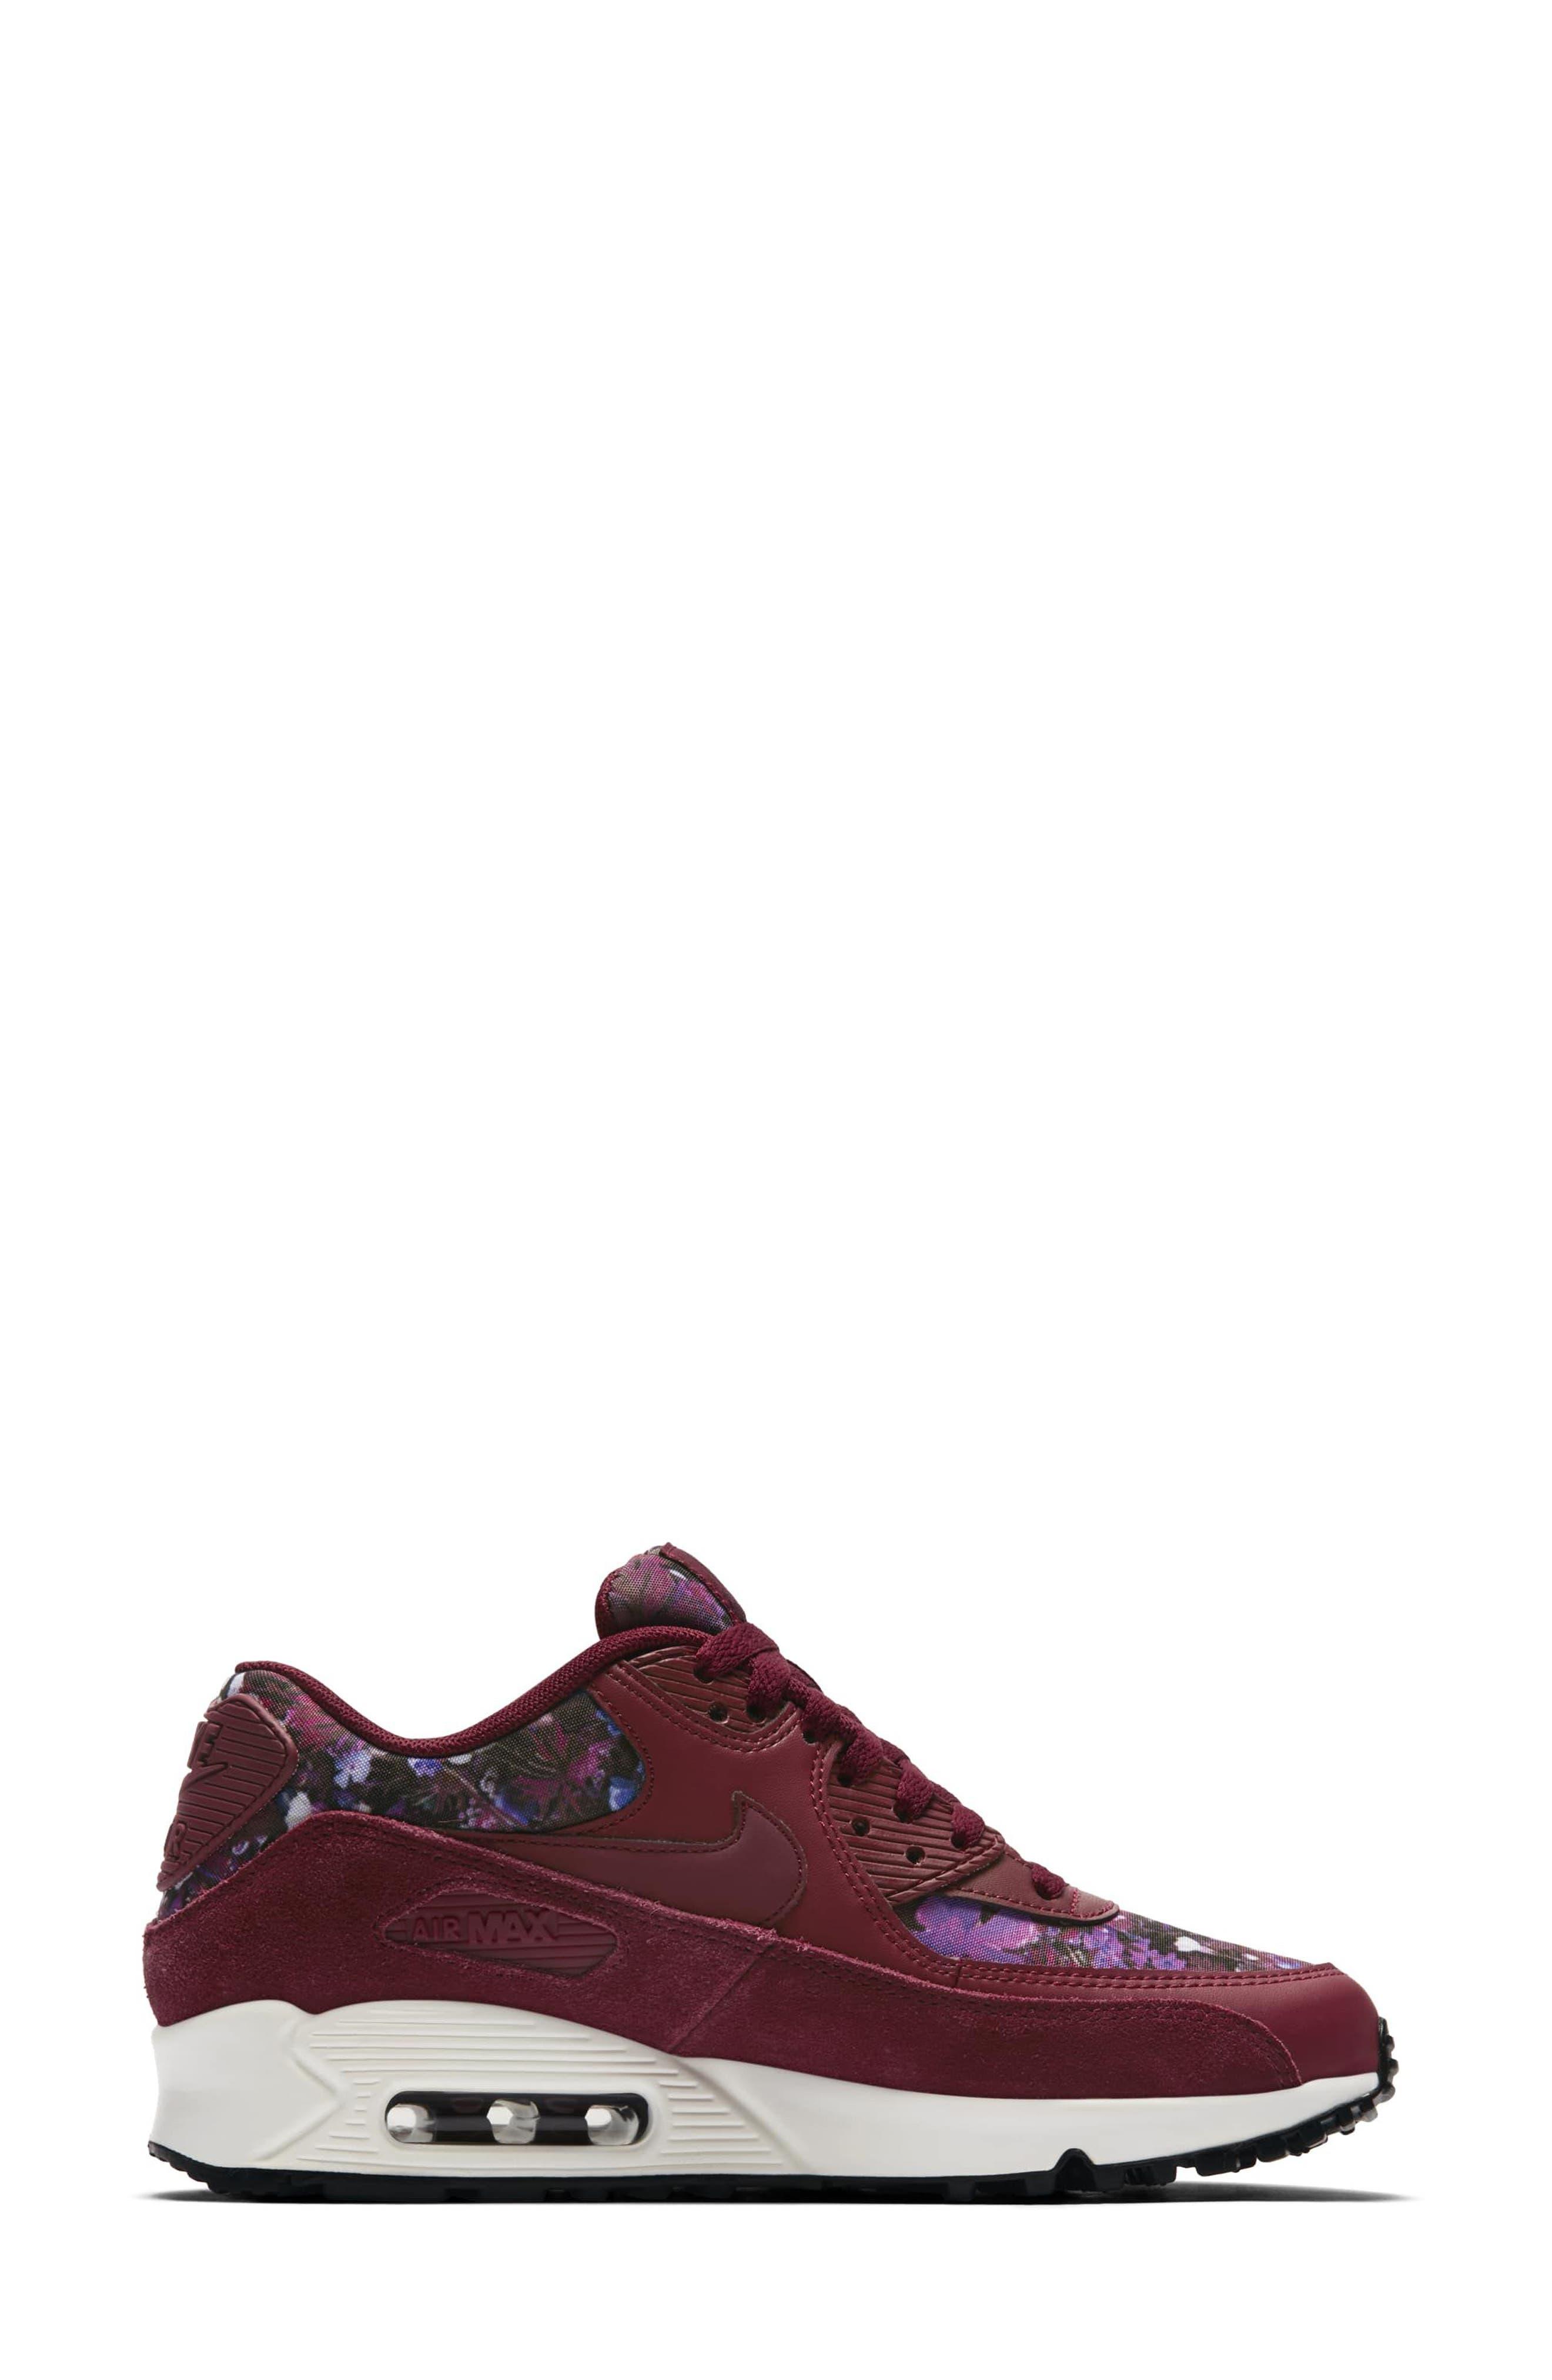 Air Max 90 SE Sneaker,                             Alternate thumbnail 27, color,